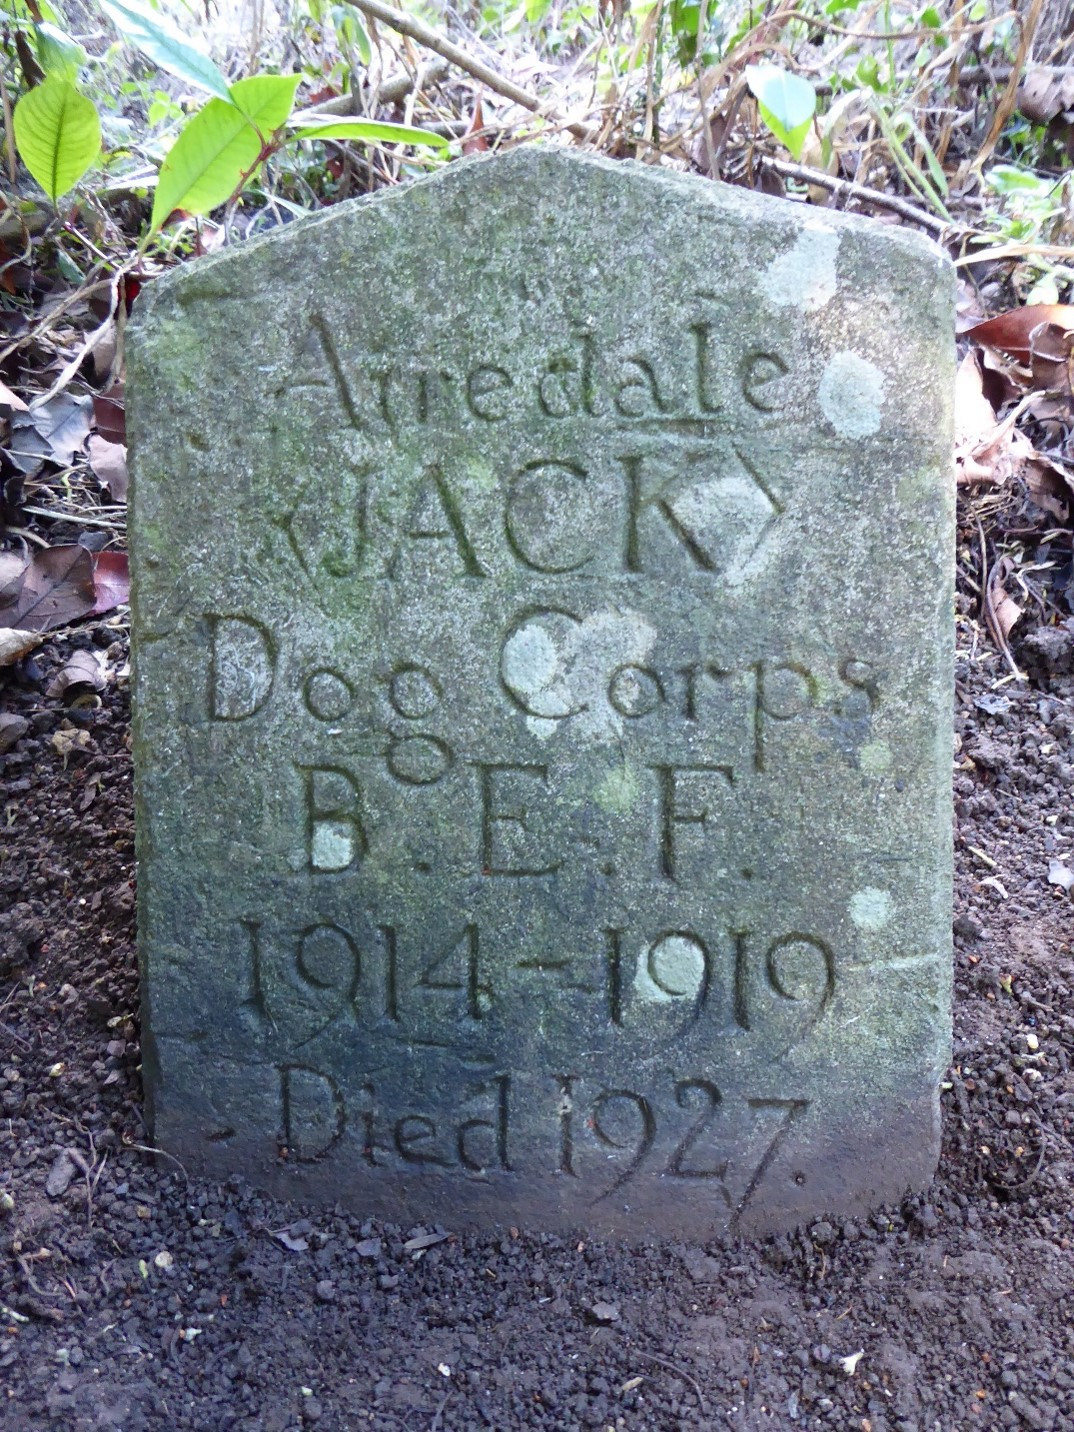 Jackthedoggrave